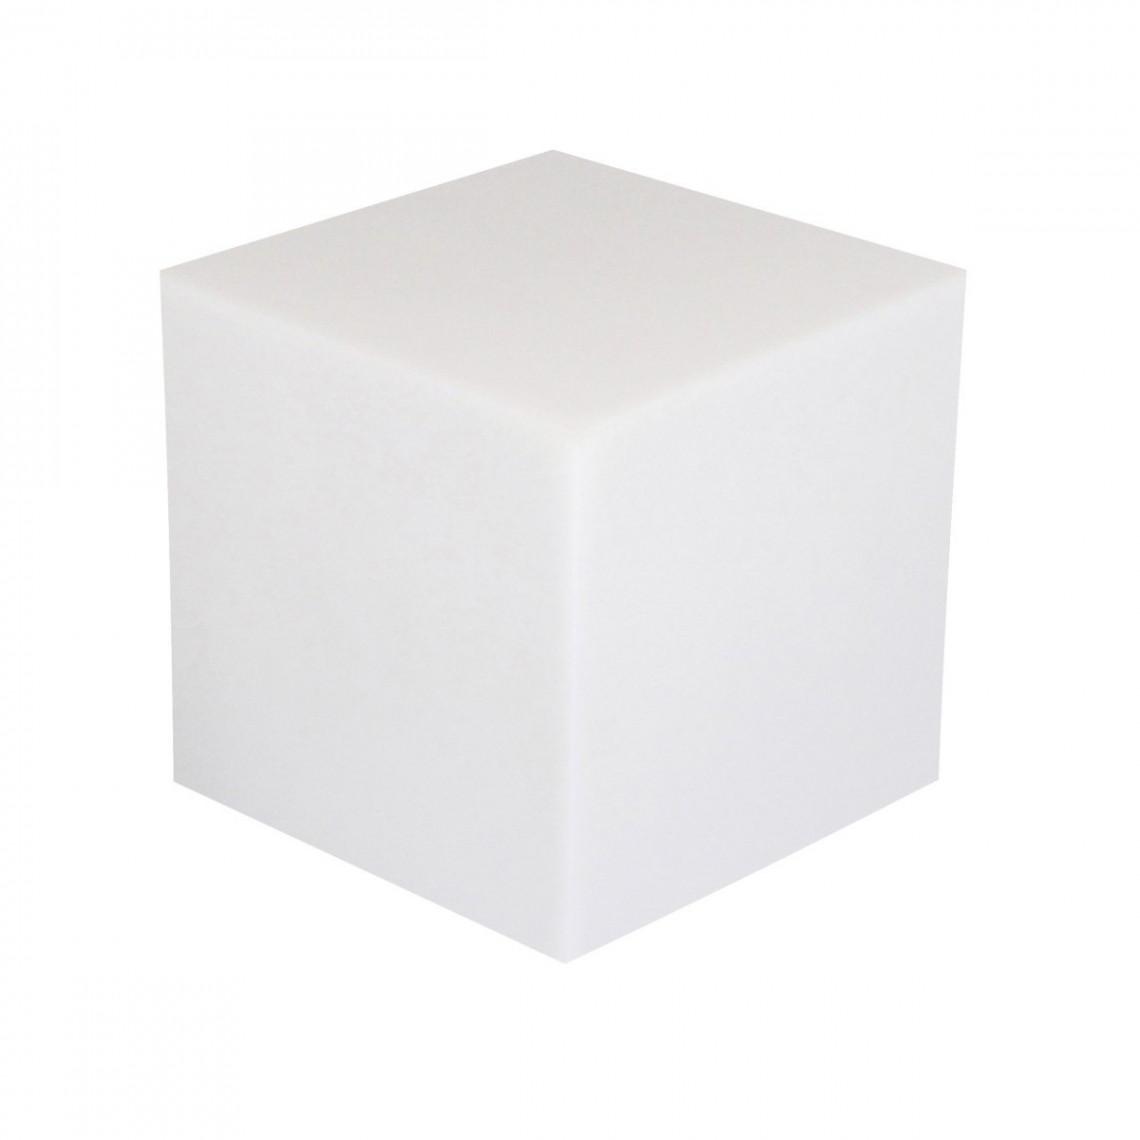 Cube lumineux sans fil Electra